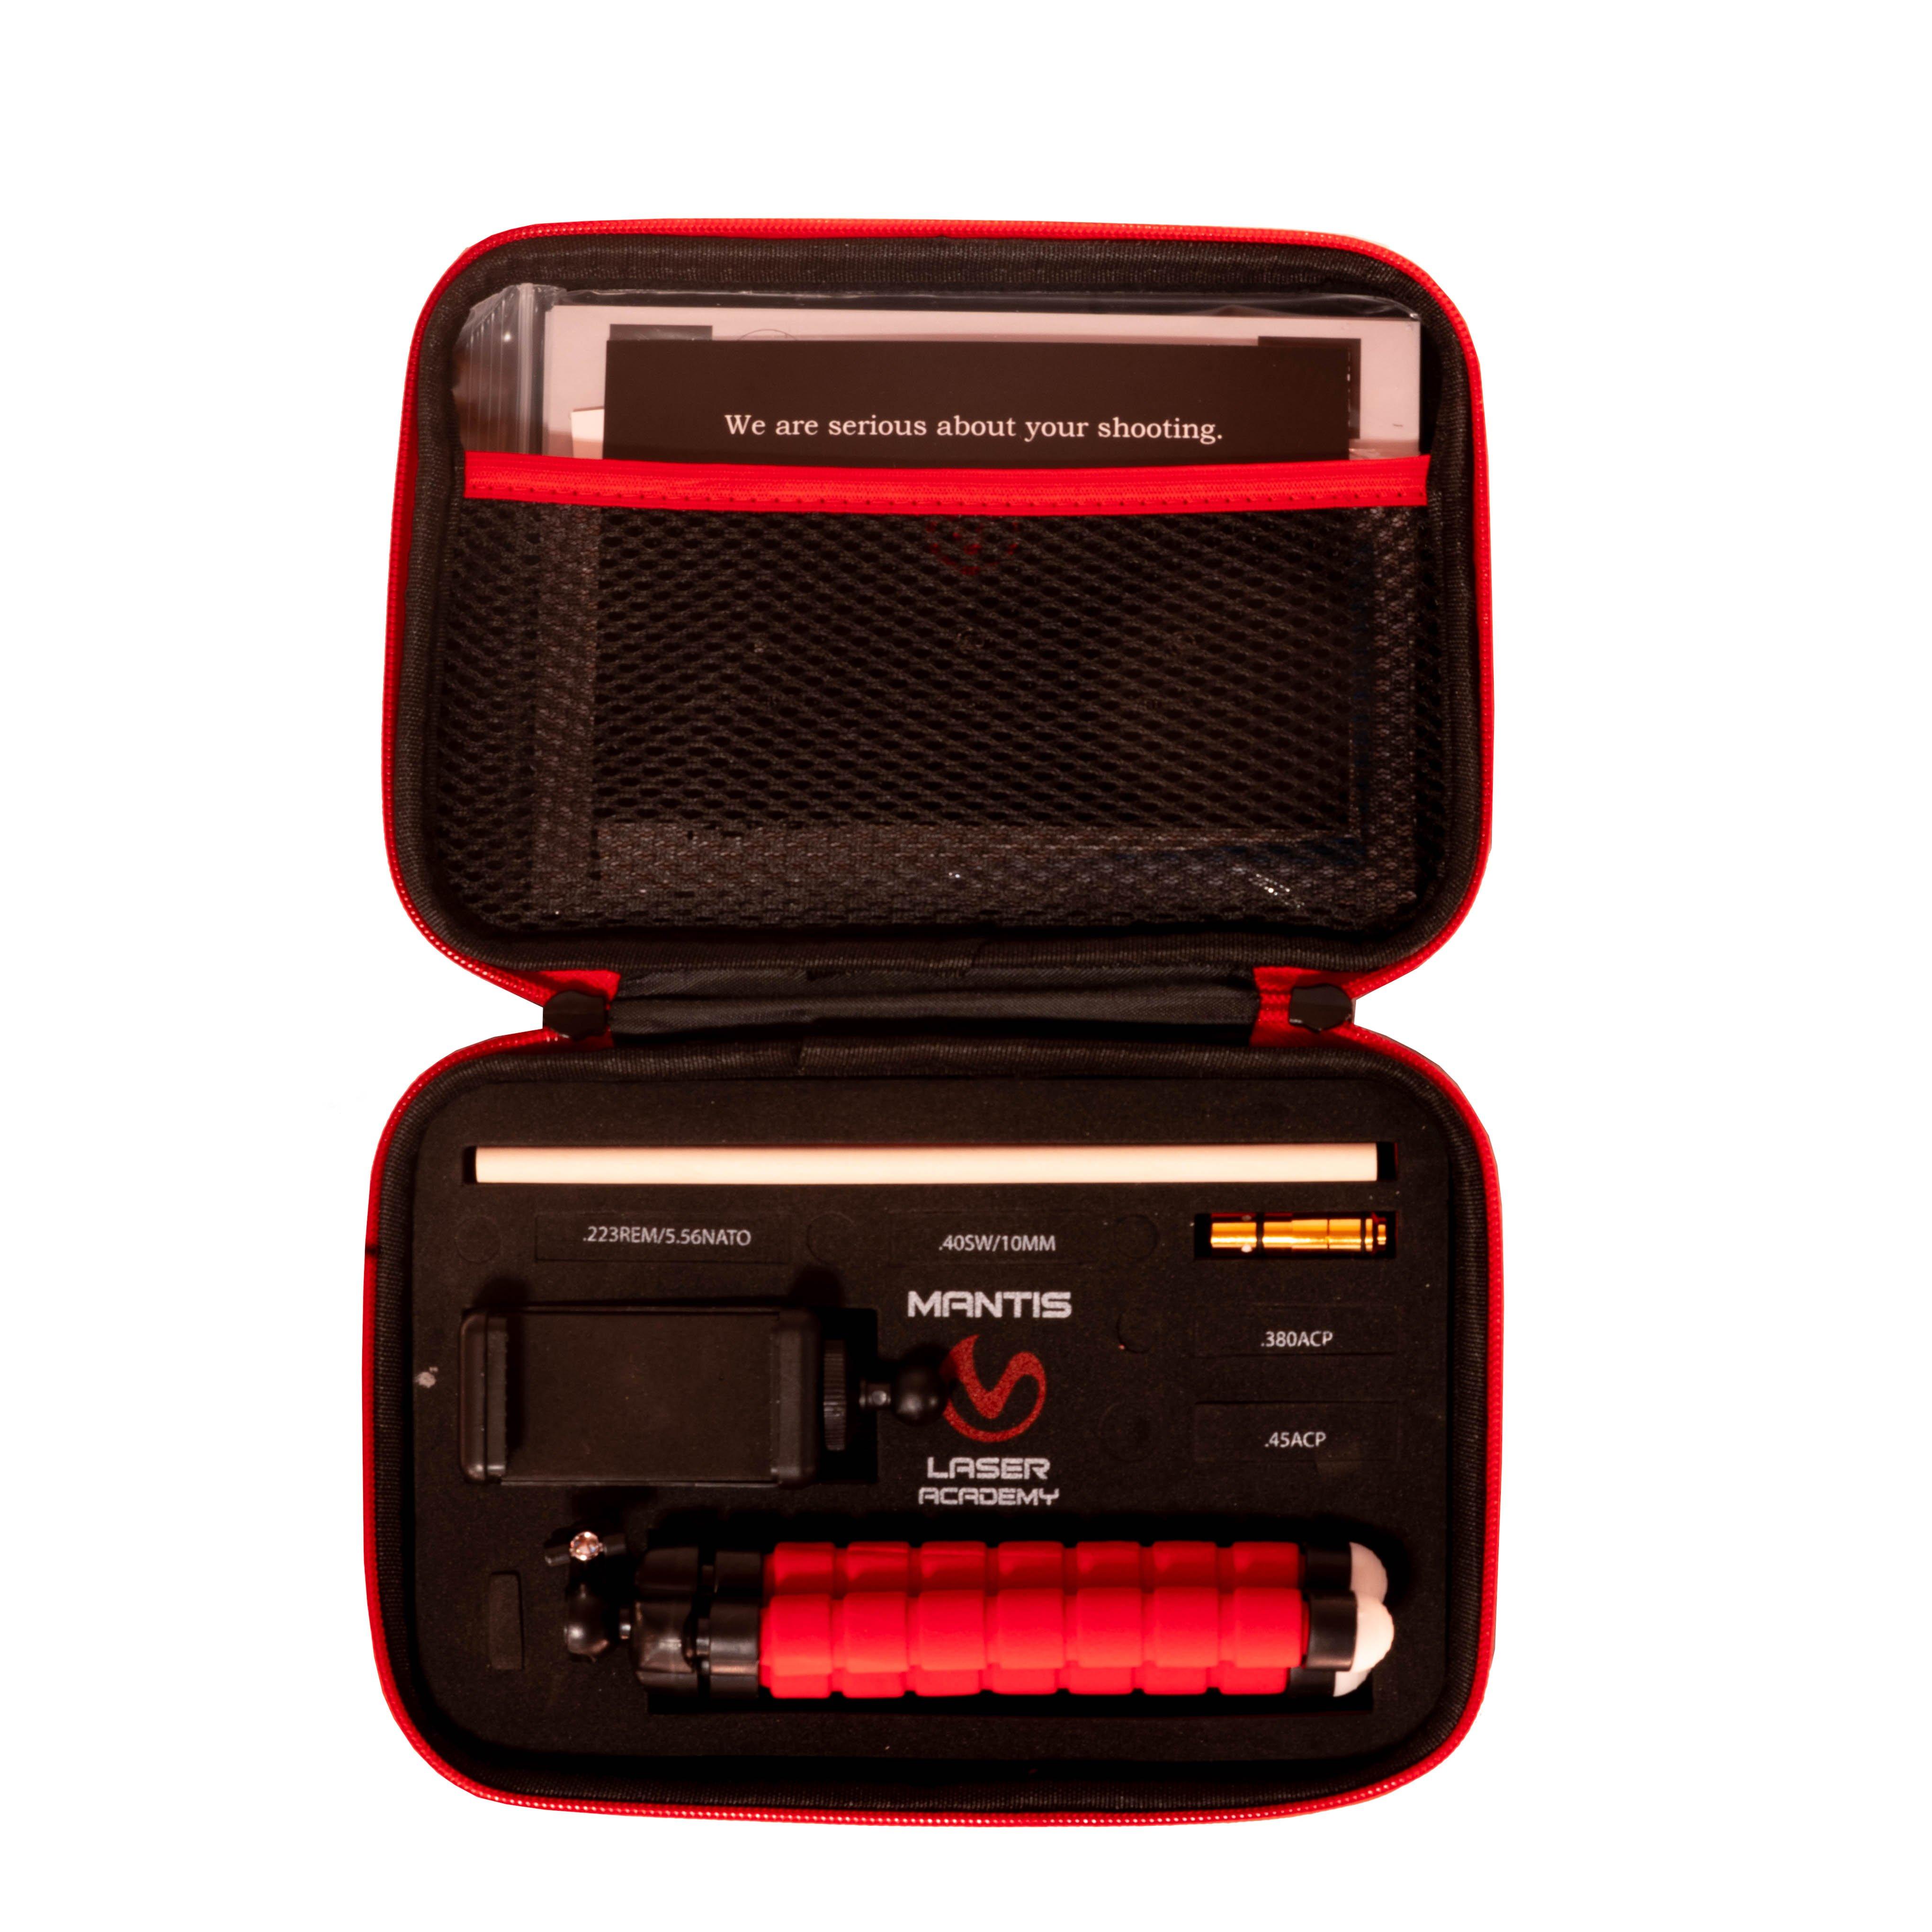 MantisX Mantis Portable Training Kit .45 Auto